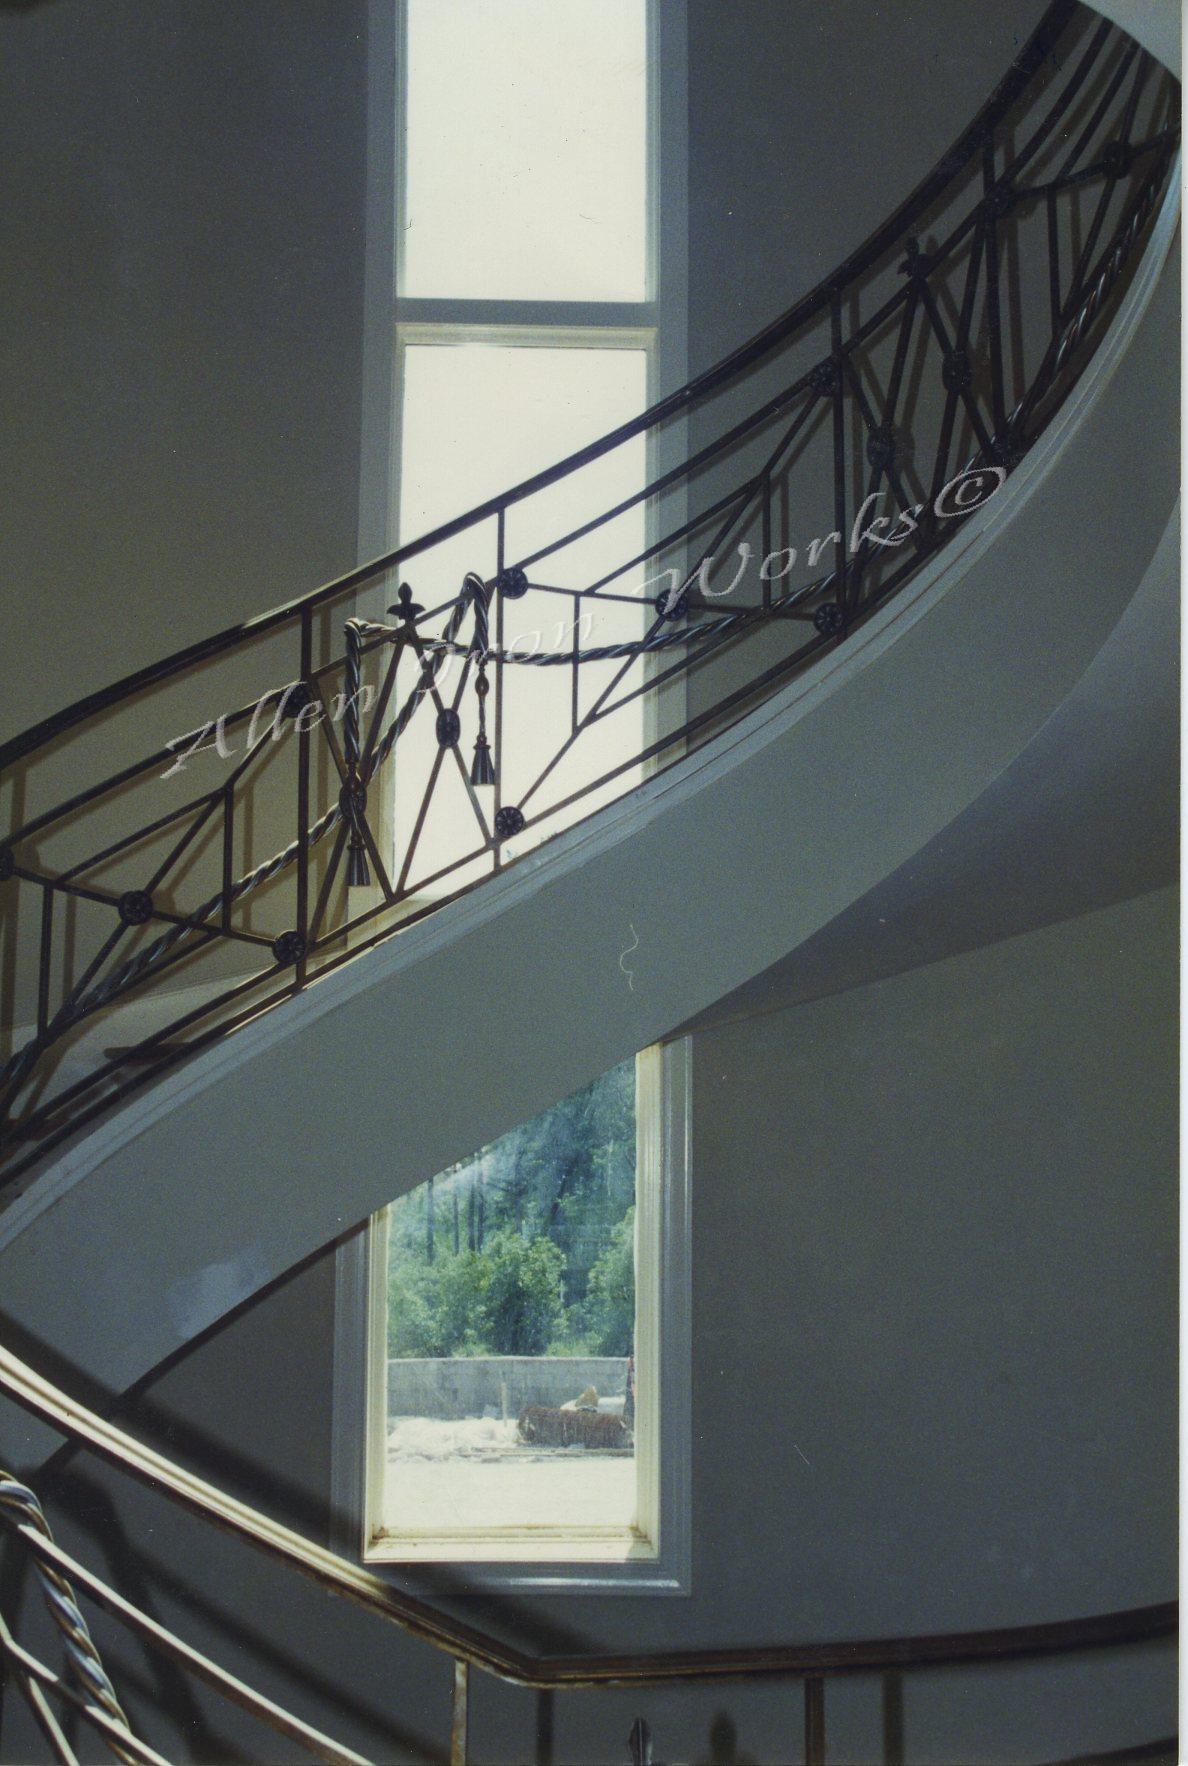 curved-interior-iron-stairway-railing-birmingham-al